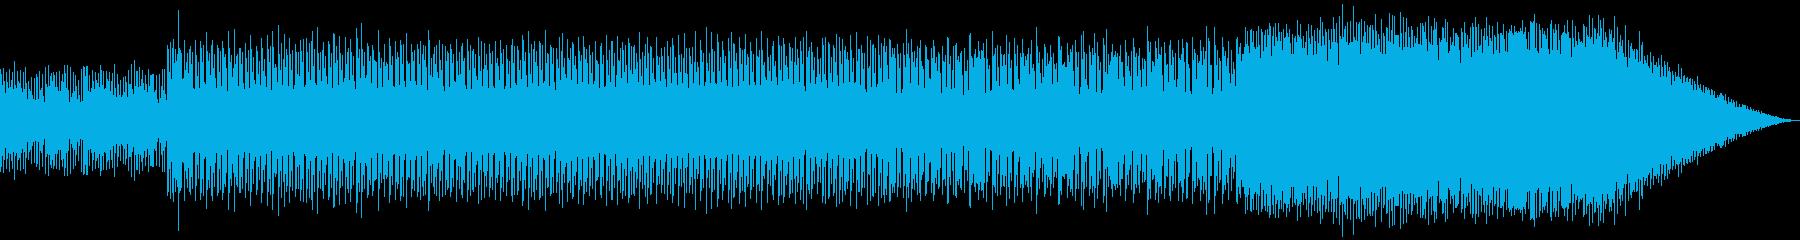 SF_シンセポップなBGMの再生済みの波形